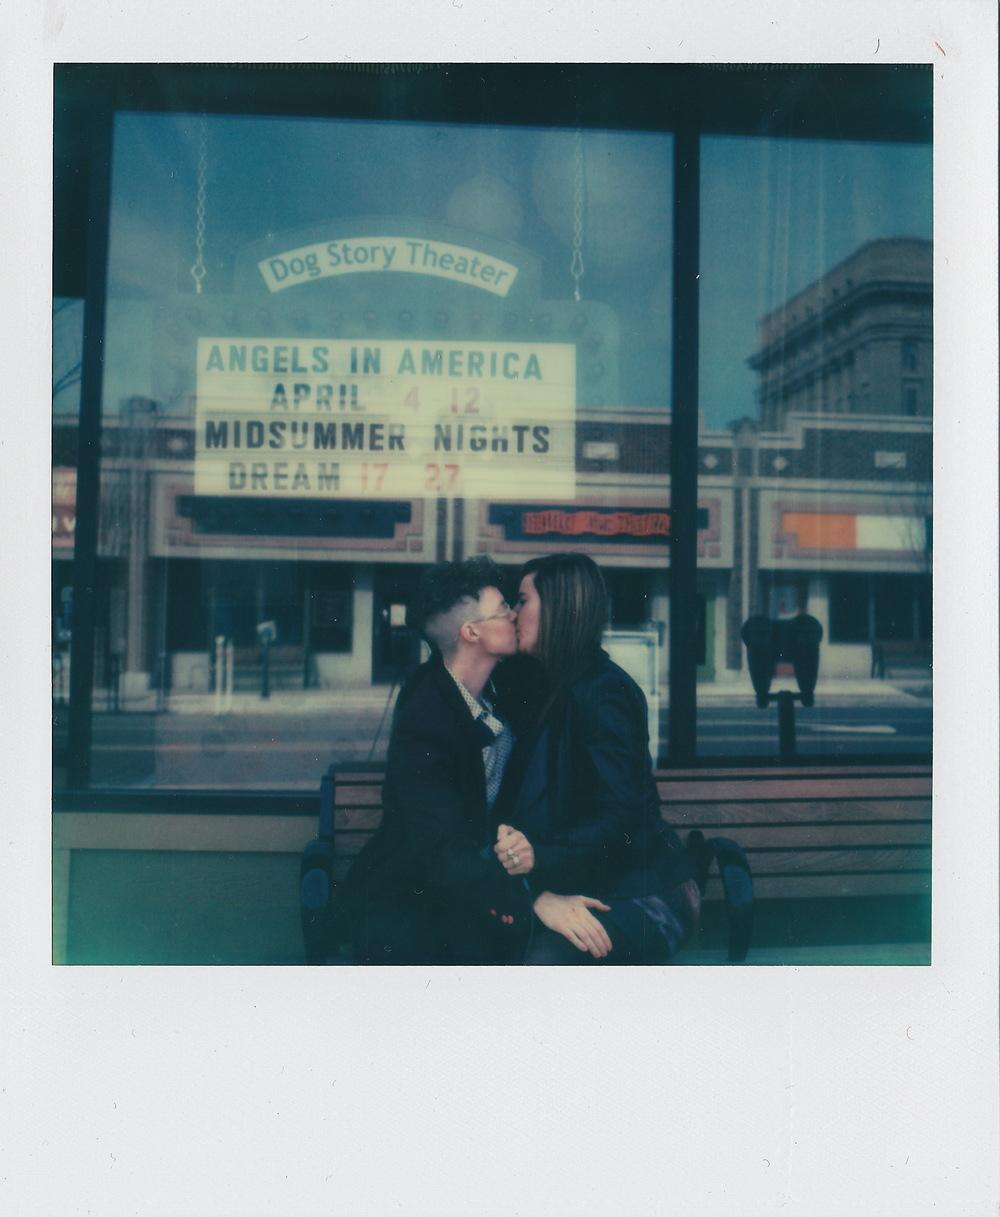 Dog Story Theater, Grand Rapids, Michigan , from  Kissing on Main Street,  2015, original SX-70 Polaroid.